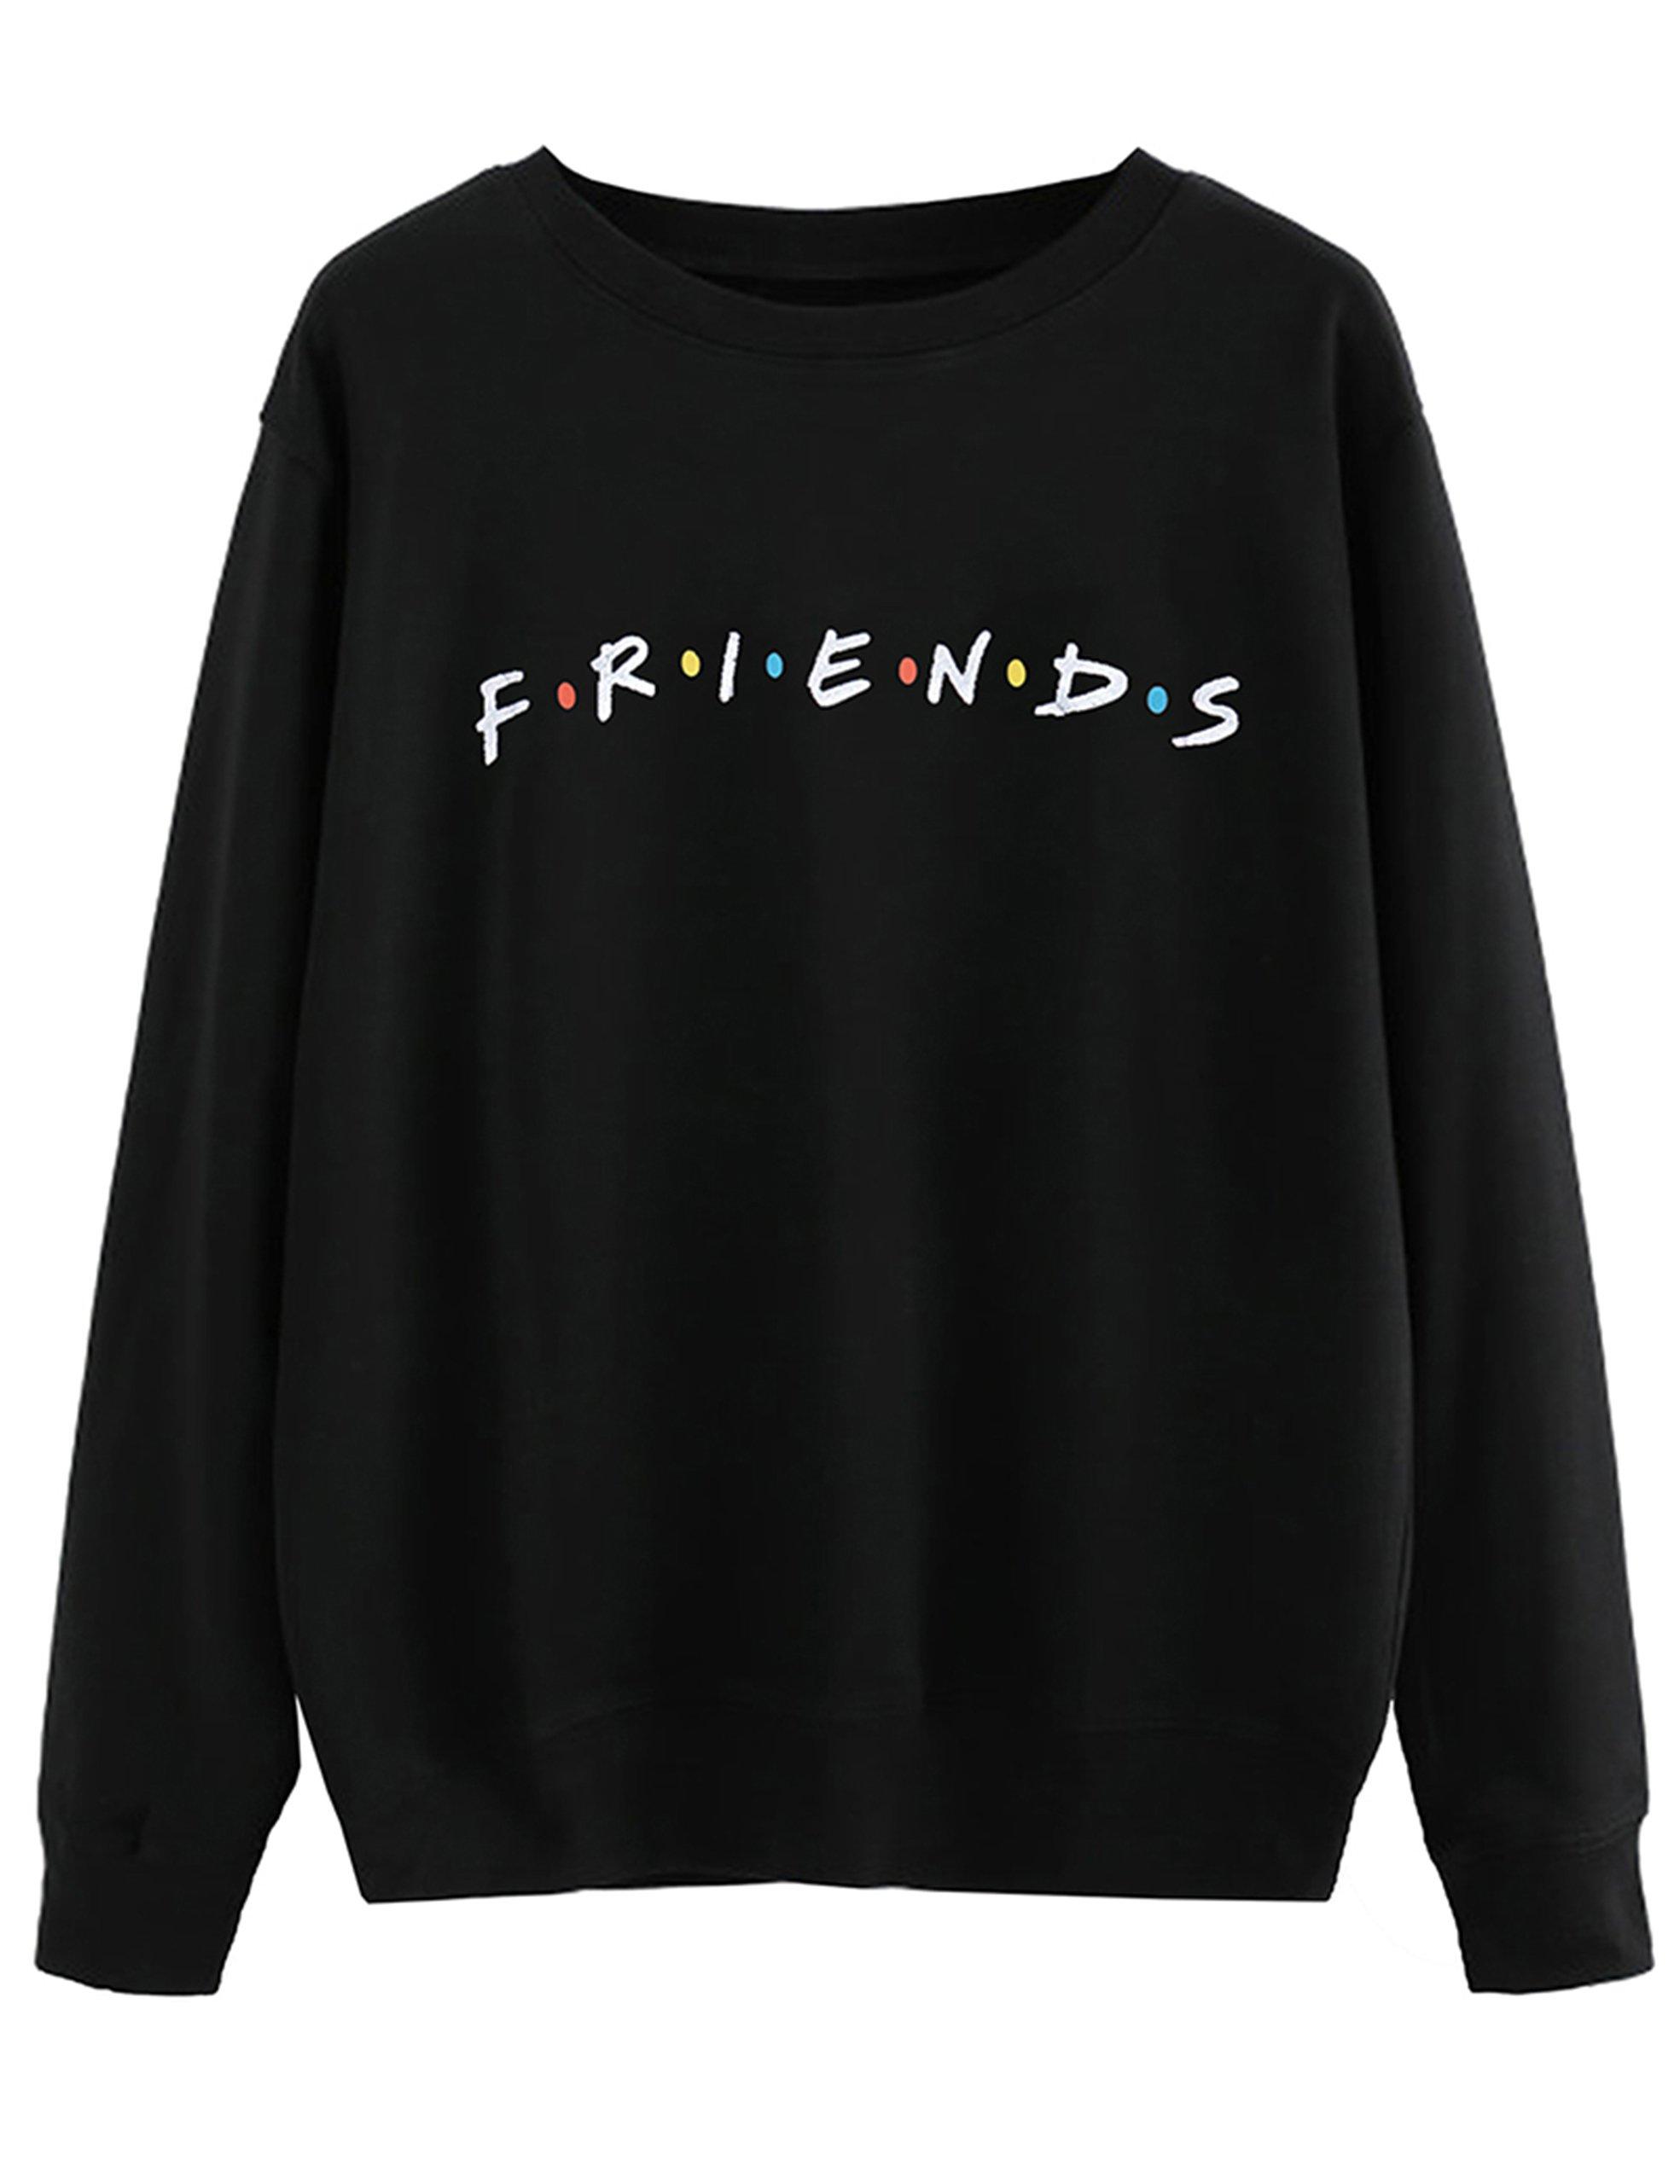 MISSACTIVER Women's Sweatshirt Letter Print Lightweight Pullover Top